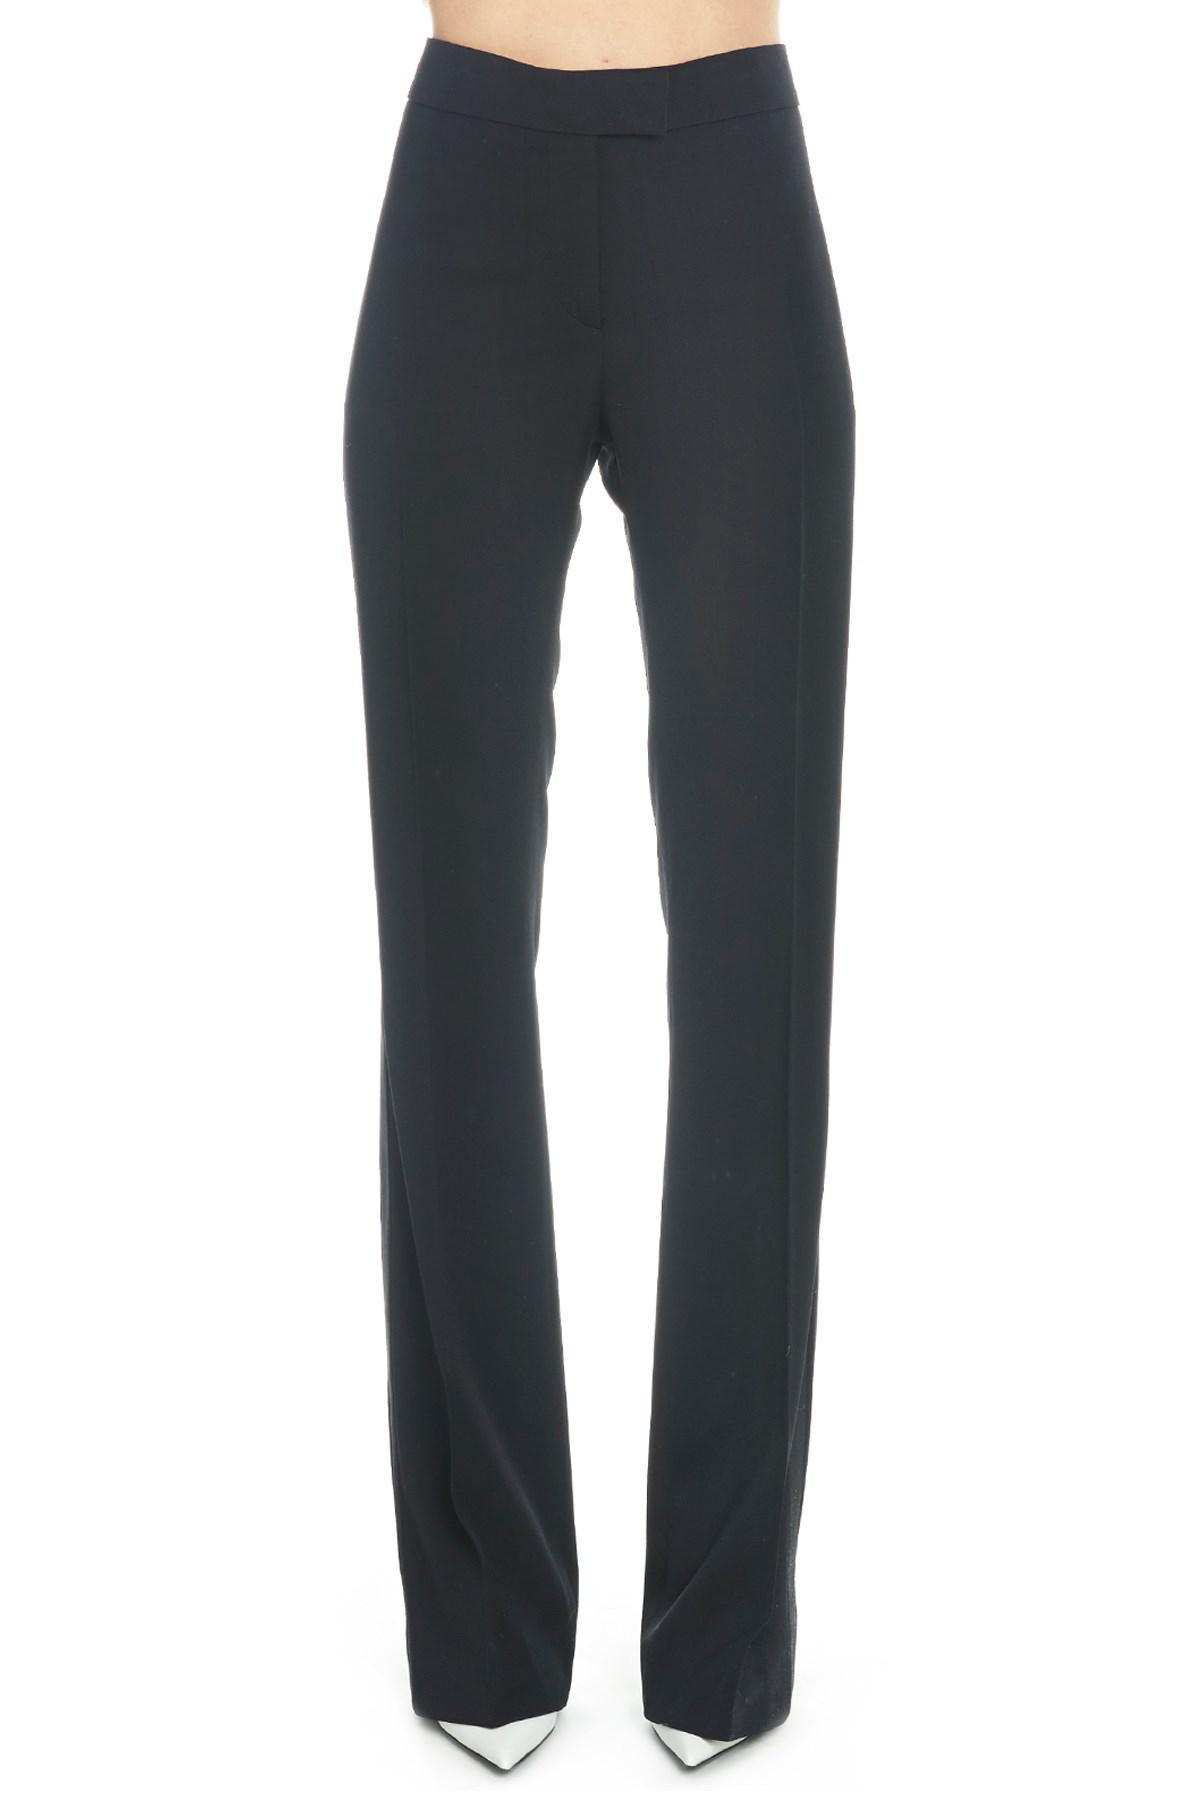 ccf0aa50c86cc Tom Ford - Black 'fluid Suiting' Pants - Lyst. View fullscreen